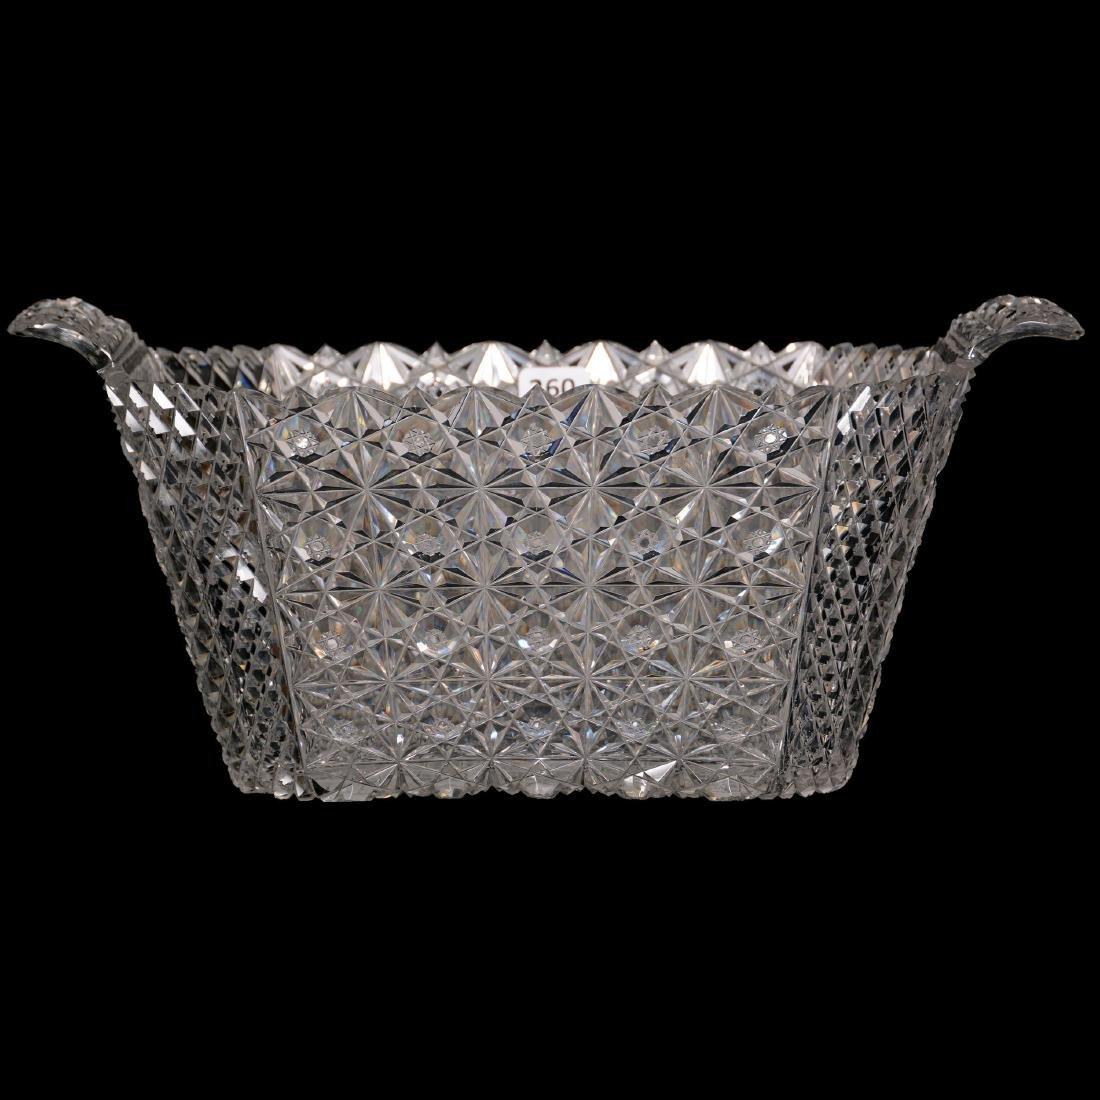 Deep Two-Handled Bowl - ABCG